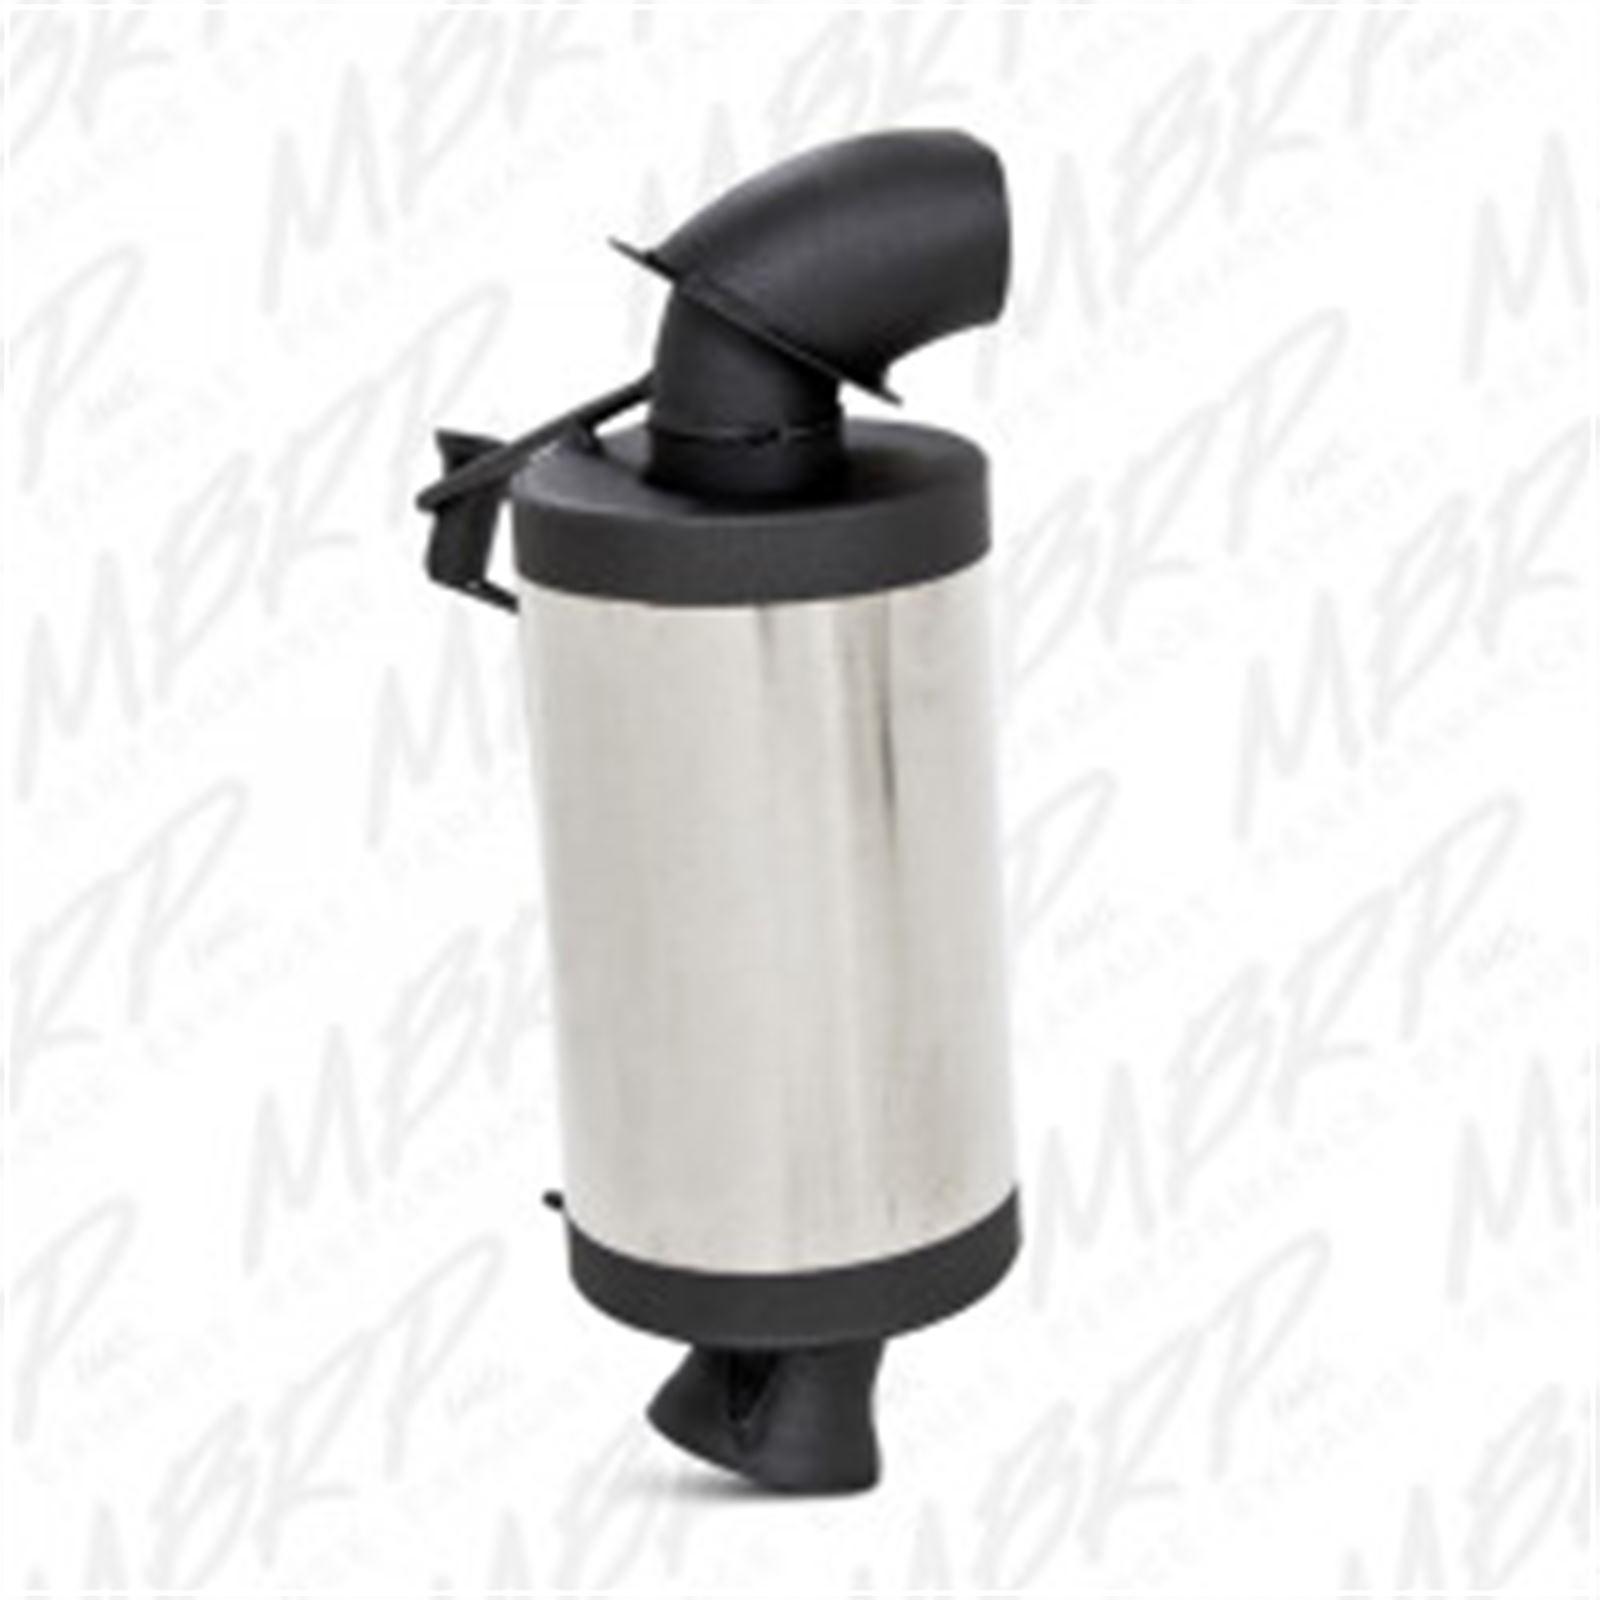 MBRP Standard Performance Exhaust